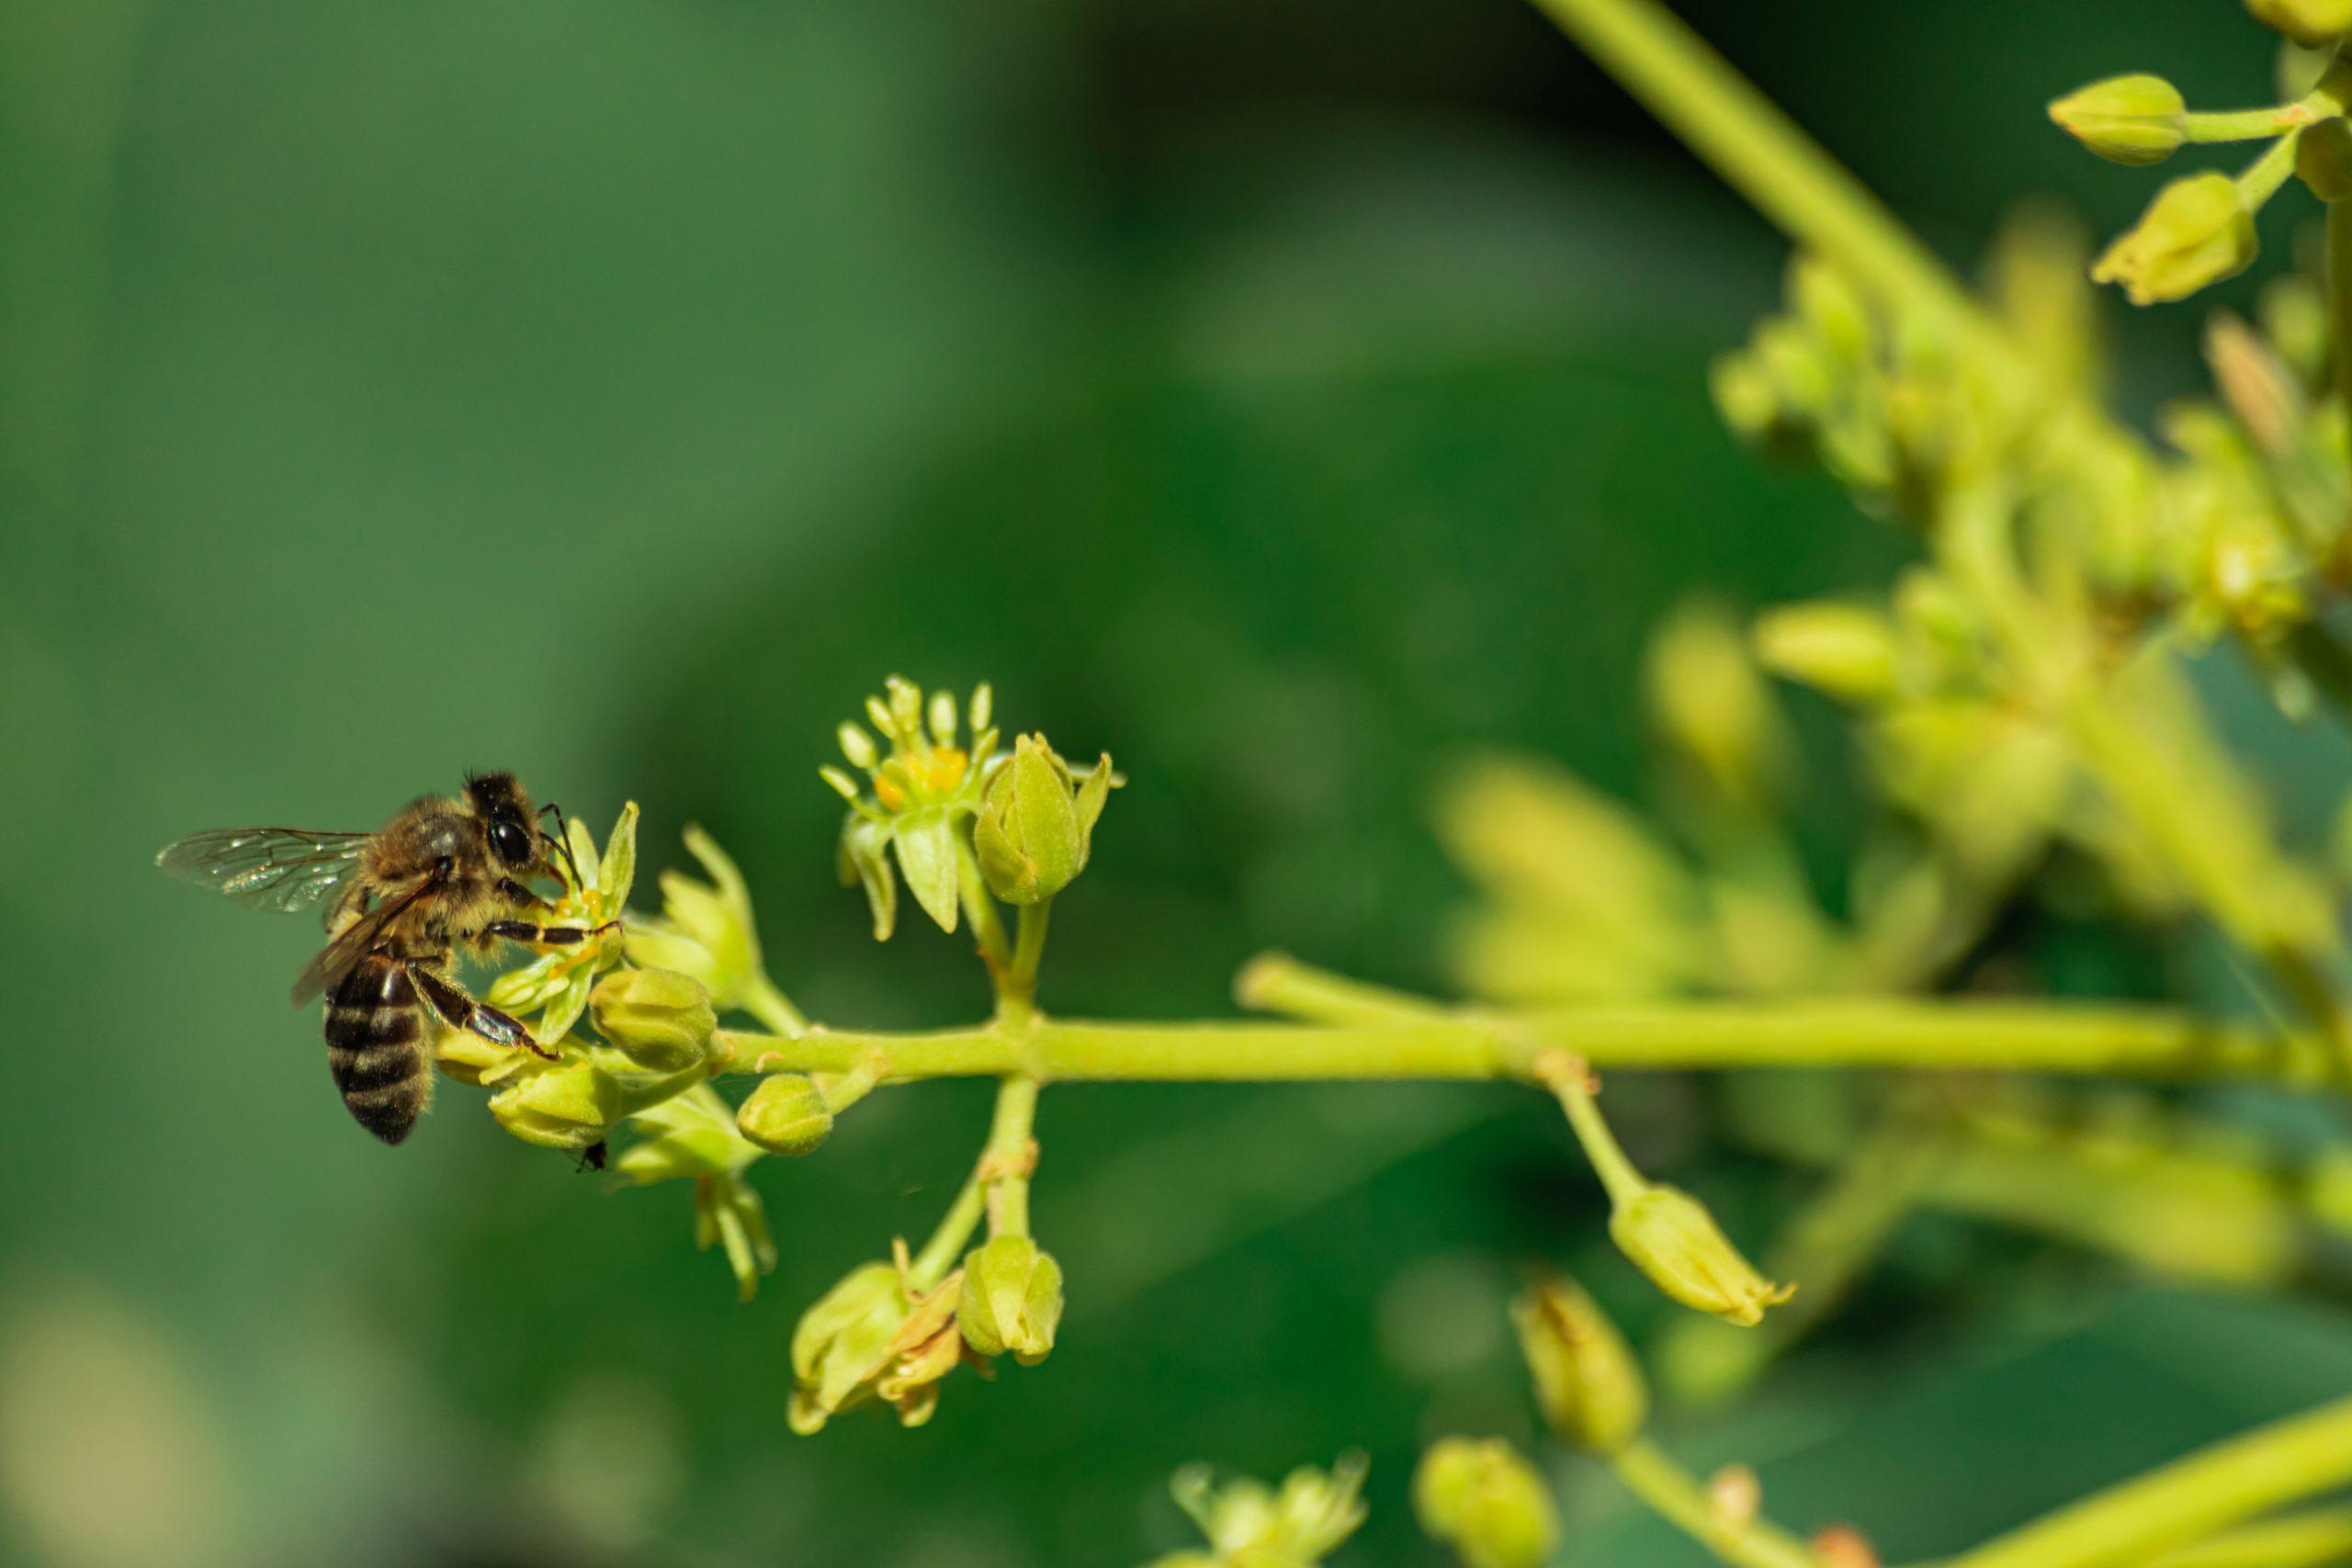 European Honey Bee Pollinating Avocado Flower